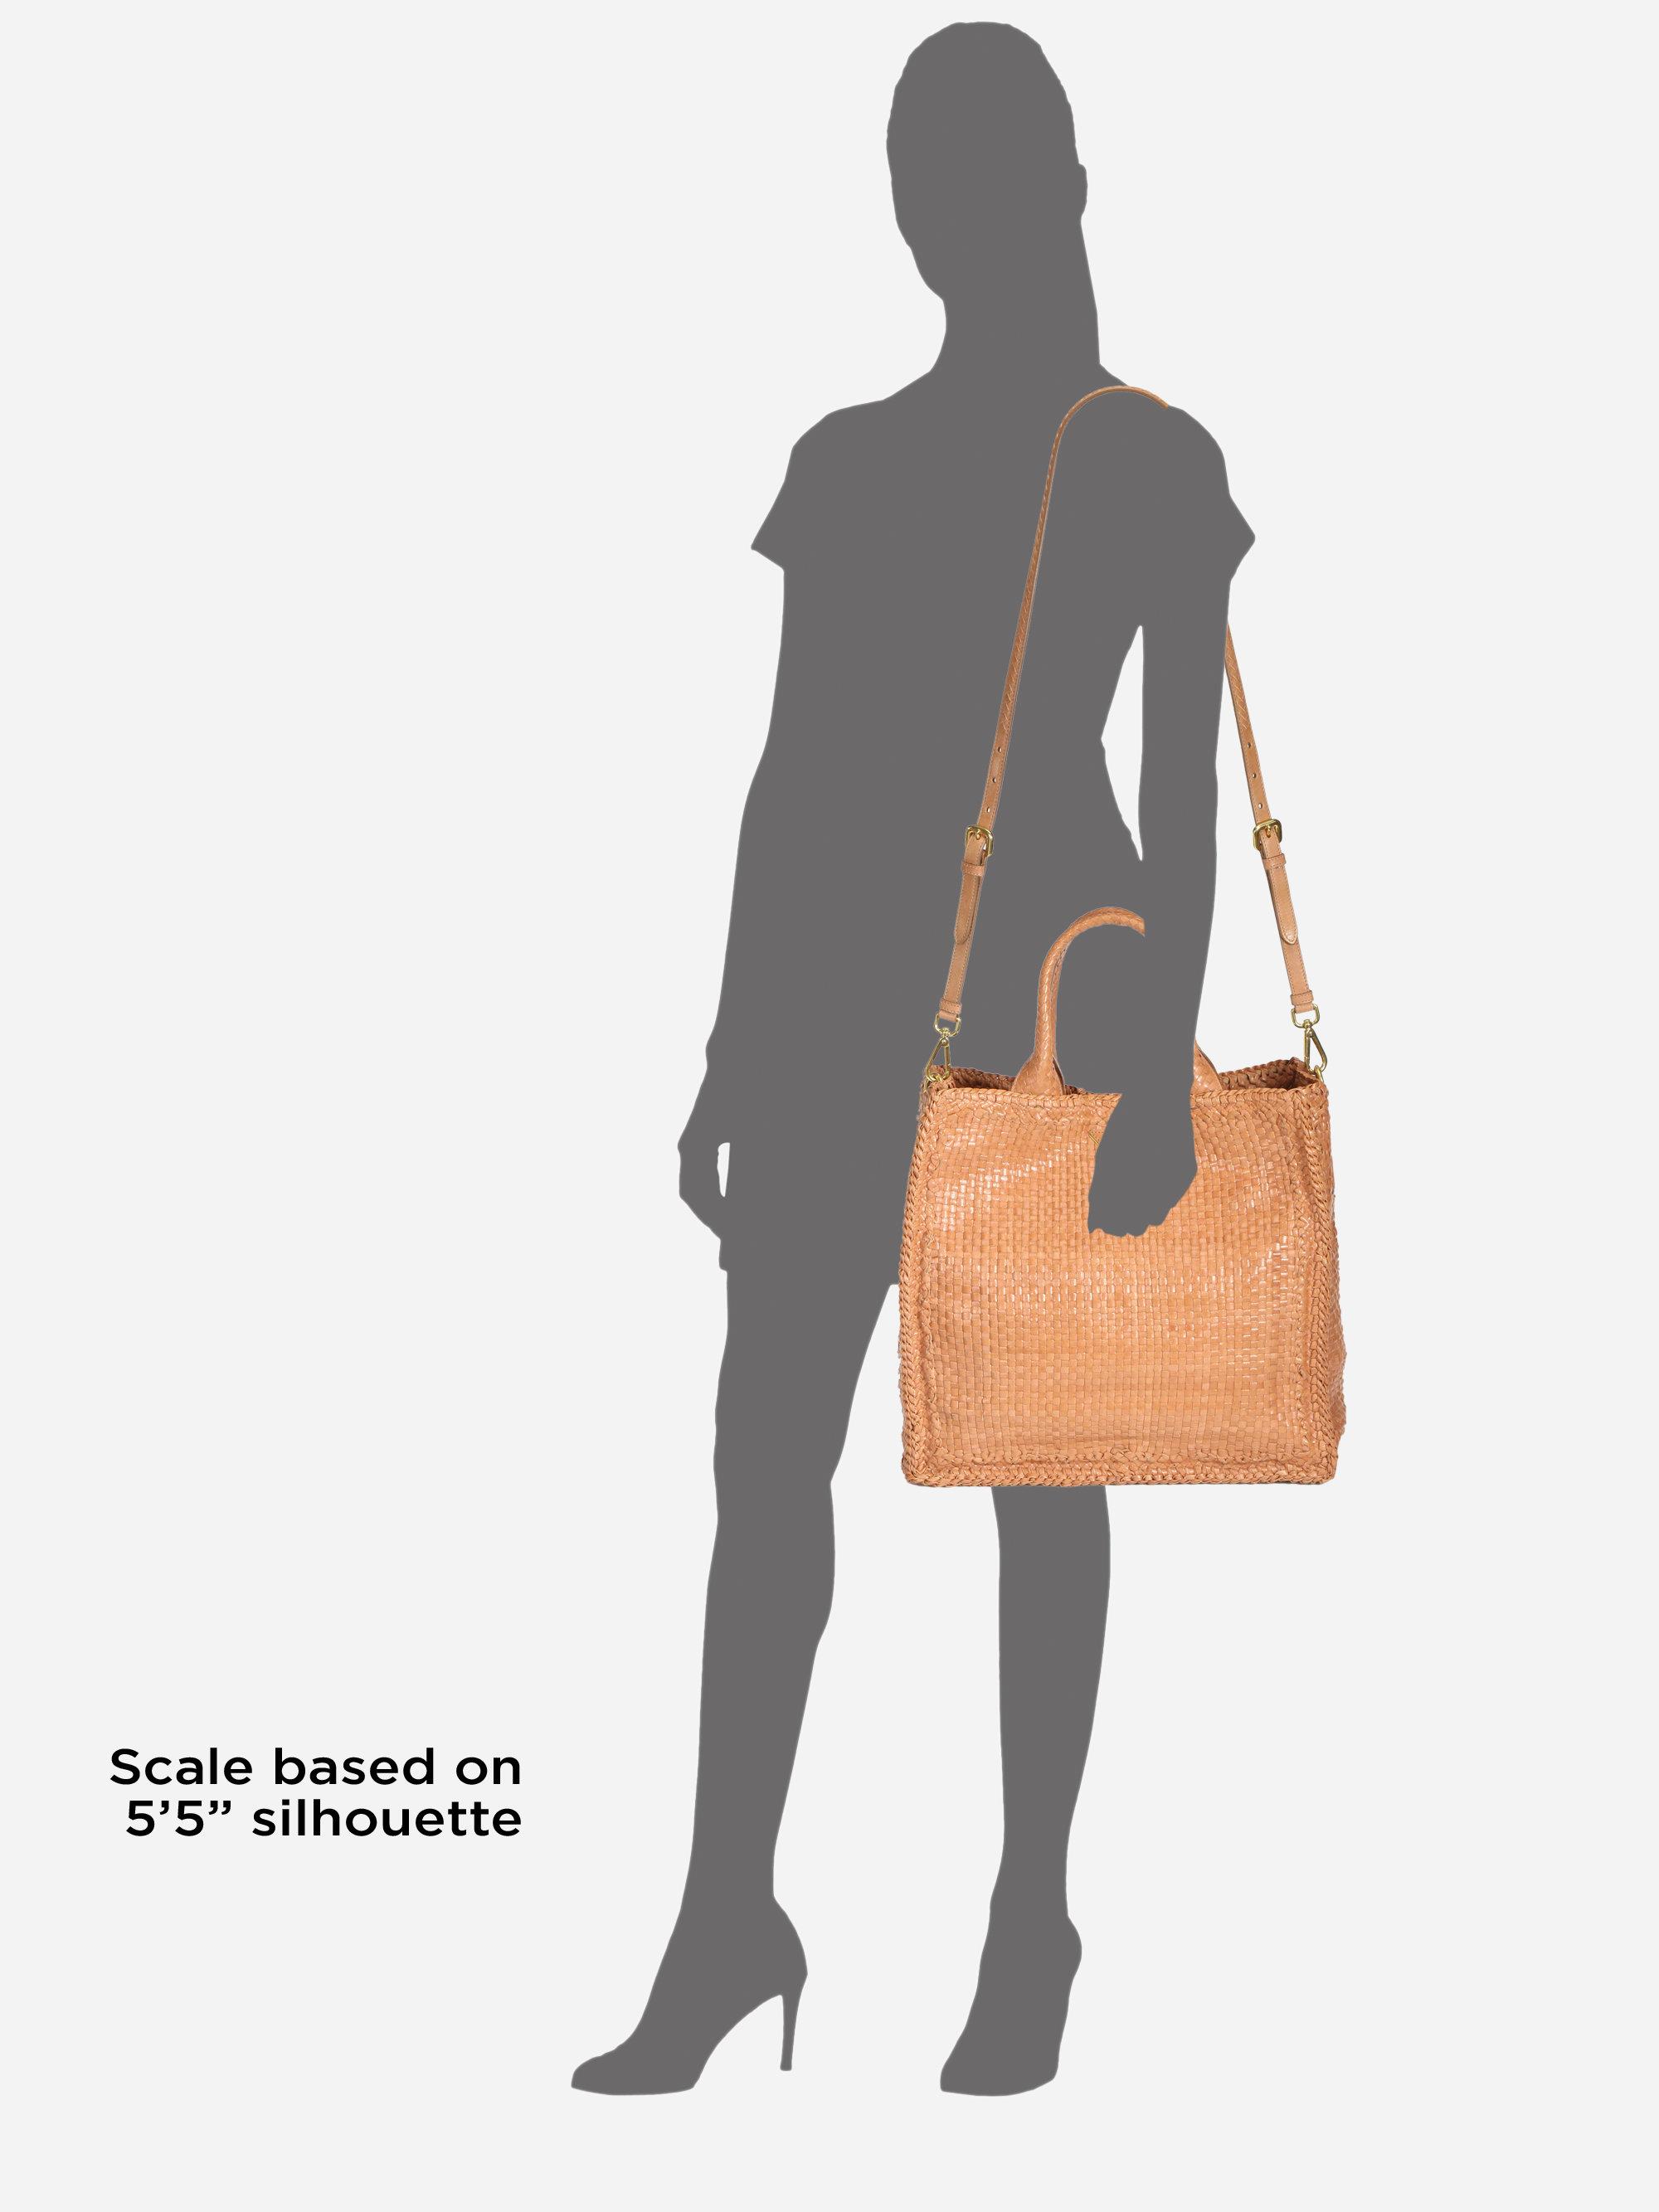 saffiano lux double-zip tote - prada madras leather bag